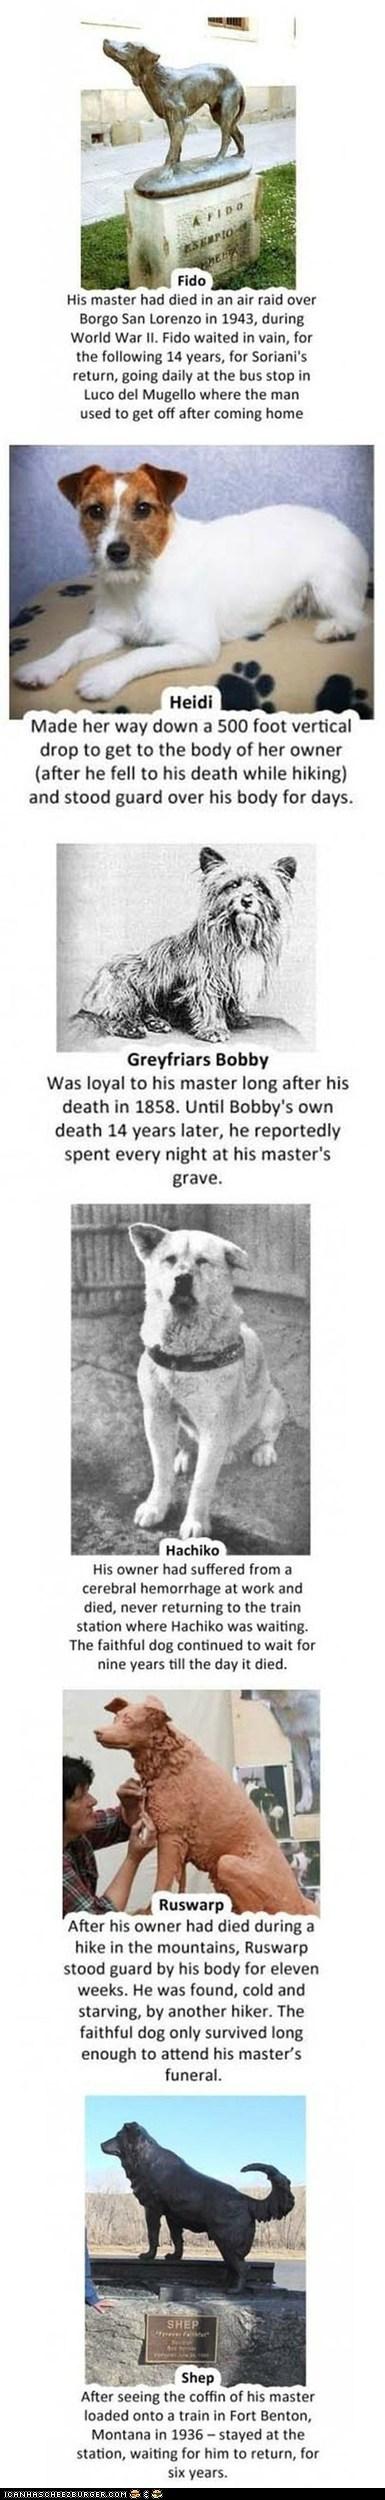 Death,dogs,inspiring,loyal,loyalty,mans-best-friend,Sad,sweet